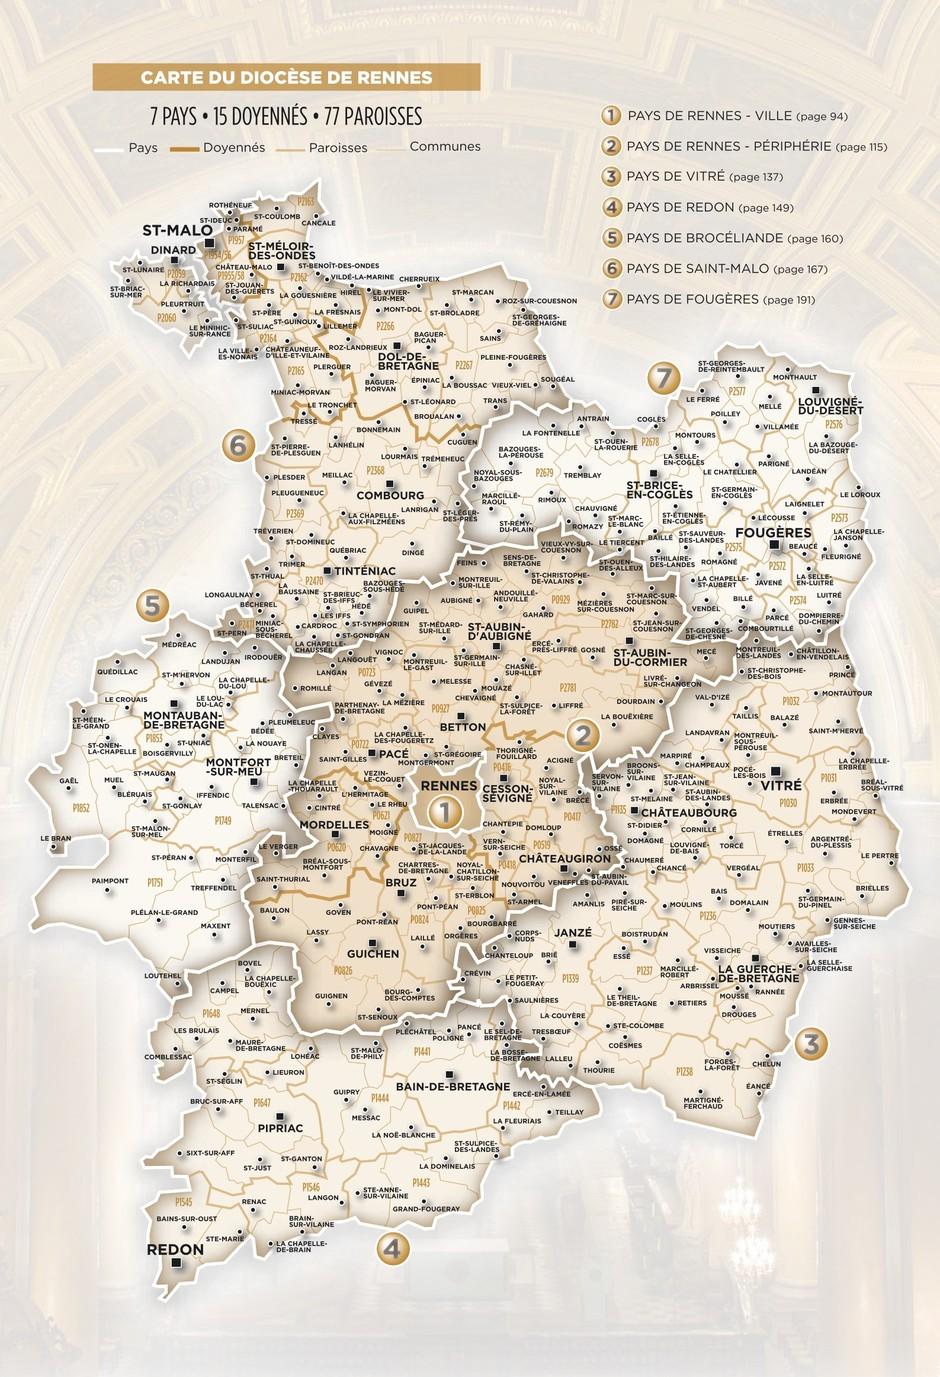 carte diocèse